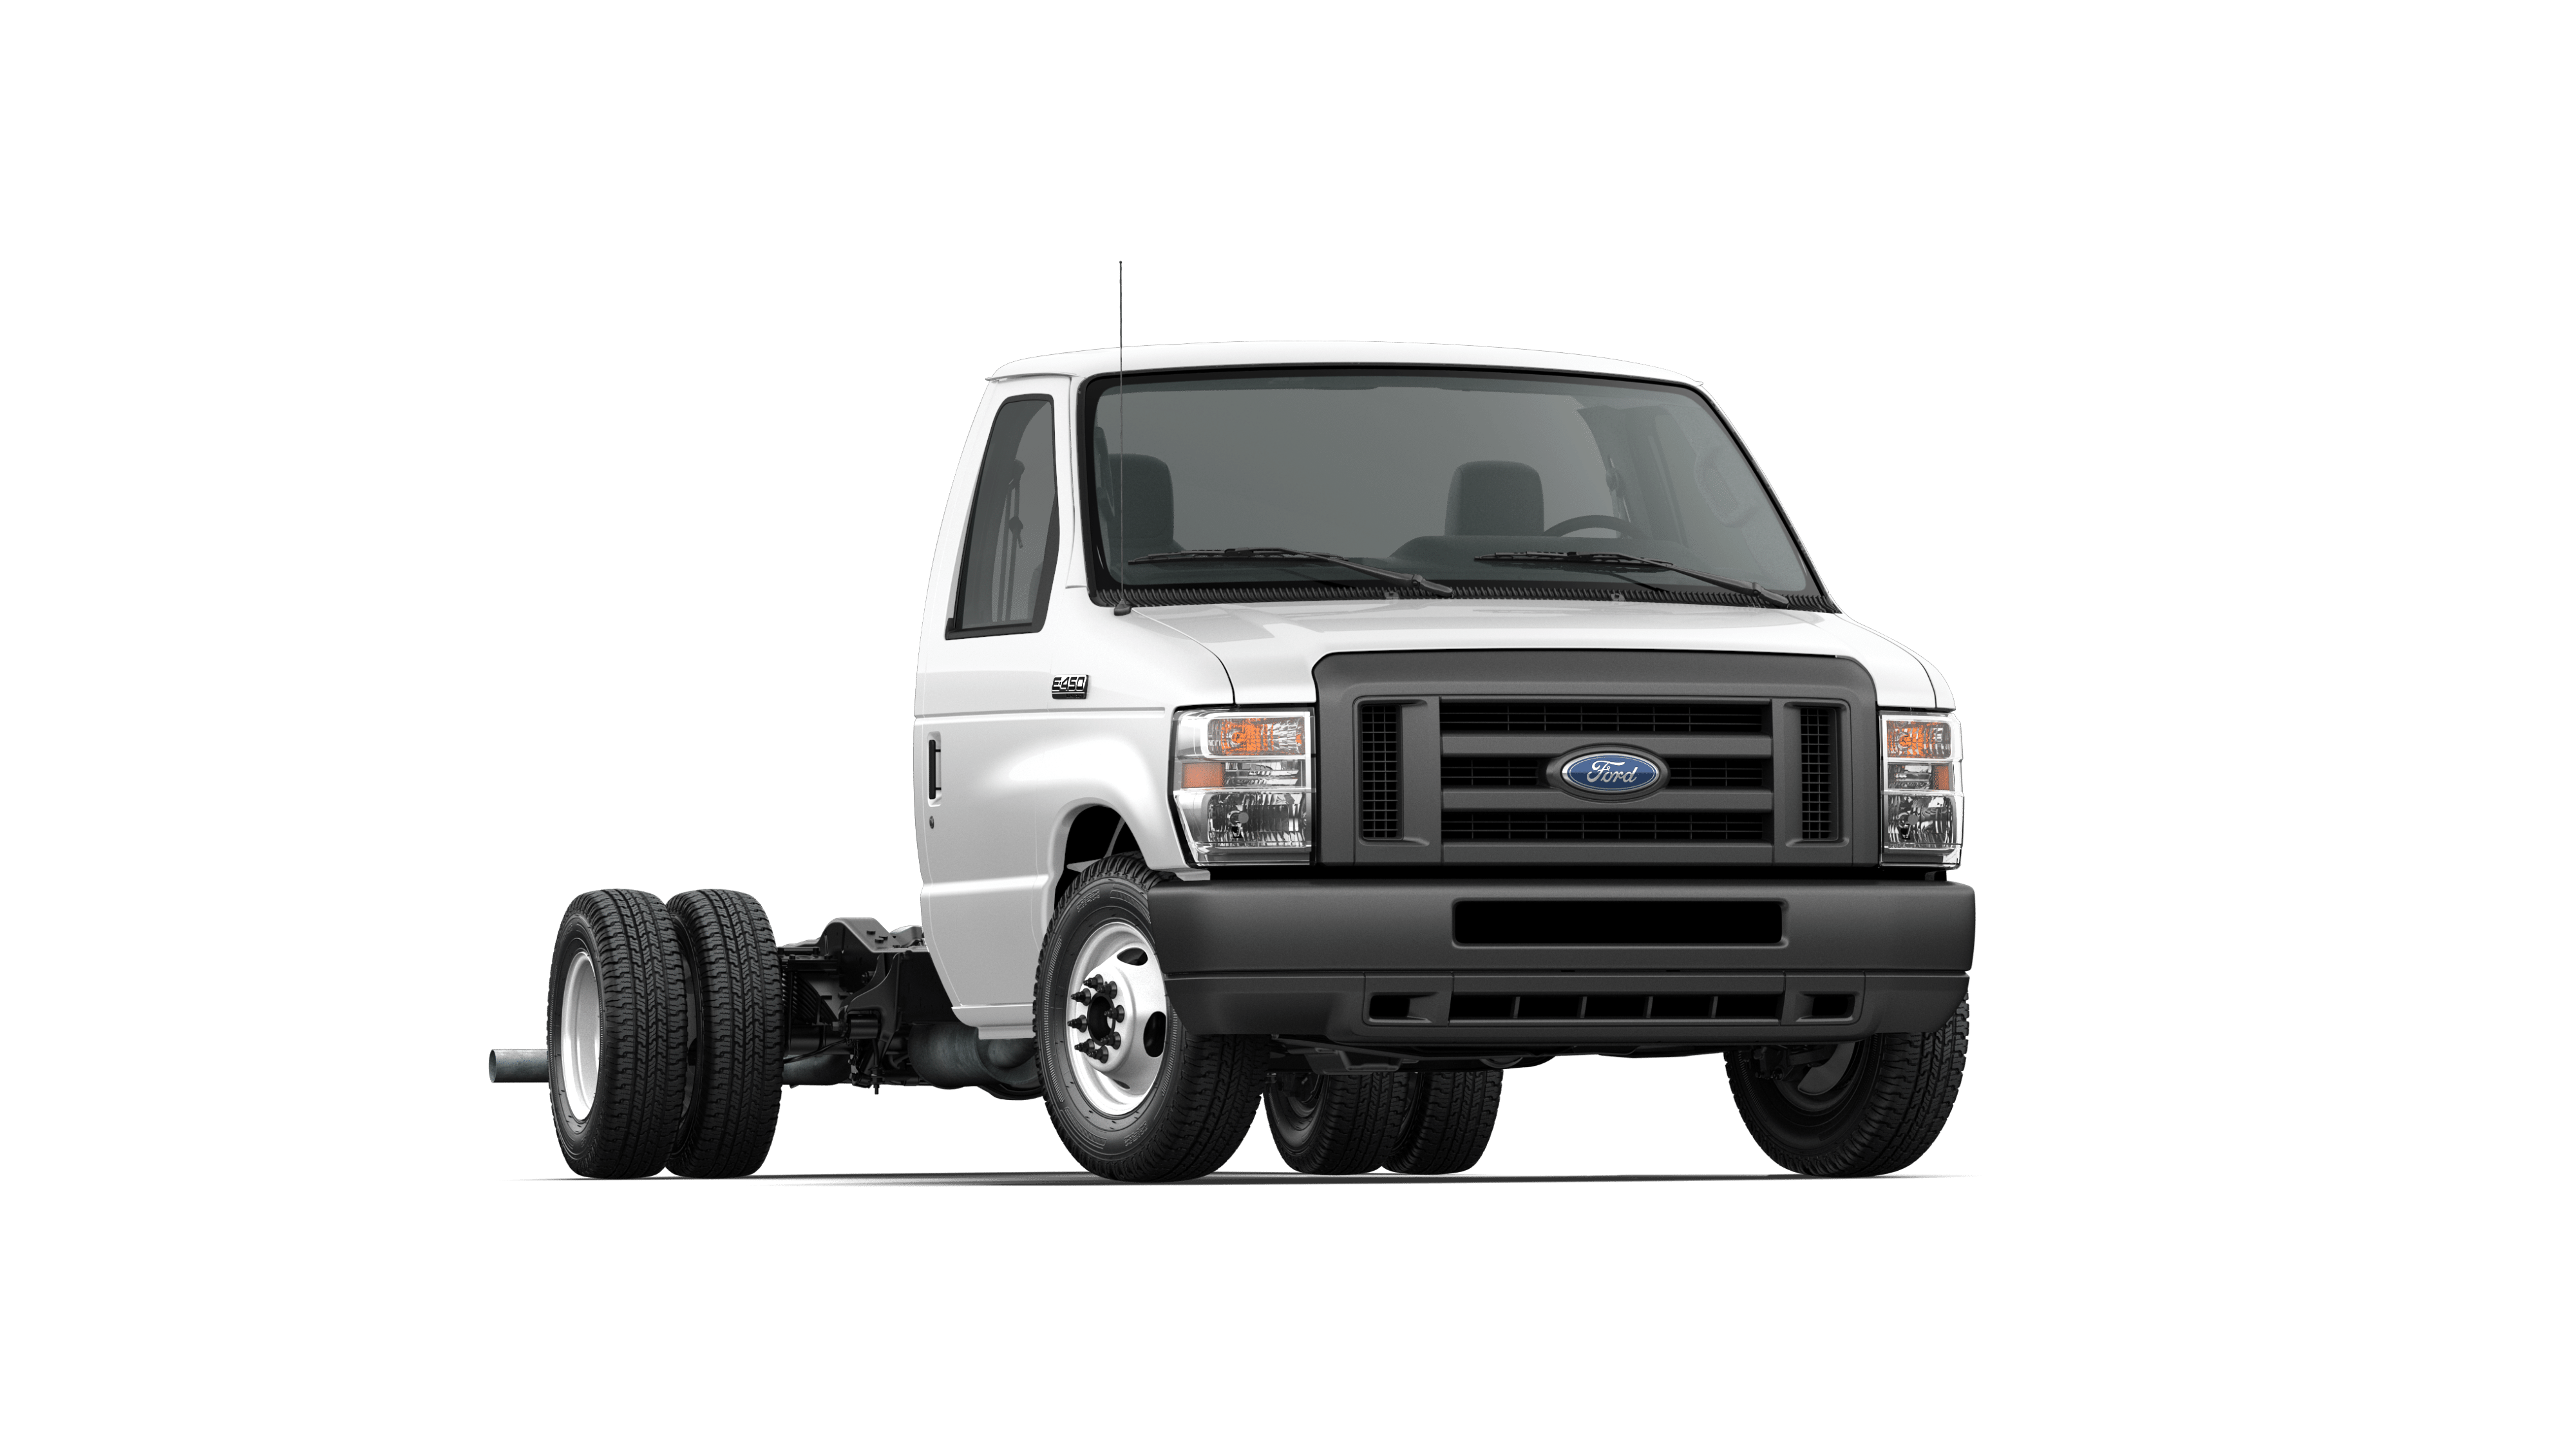 2019 Ford E Series Cutaway Vehicle Photo In Nantucket Ma 02554 2318